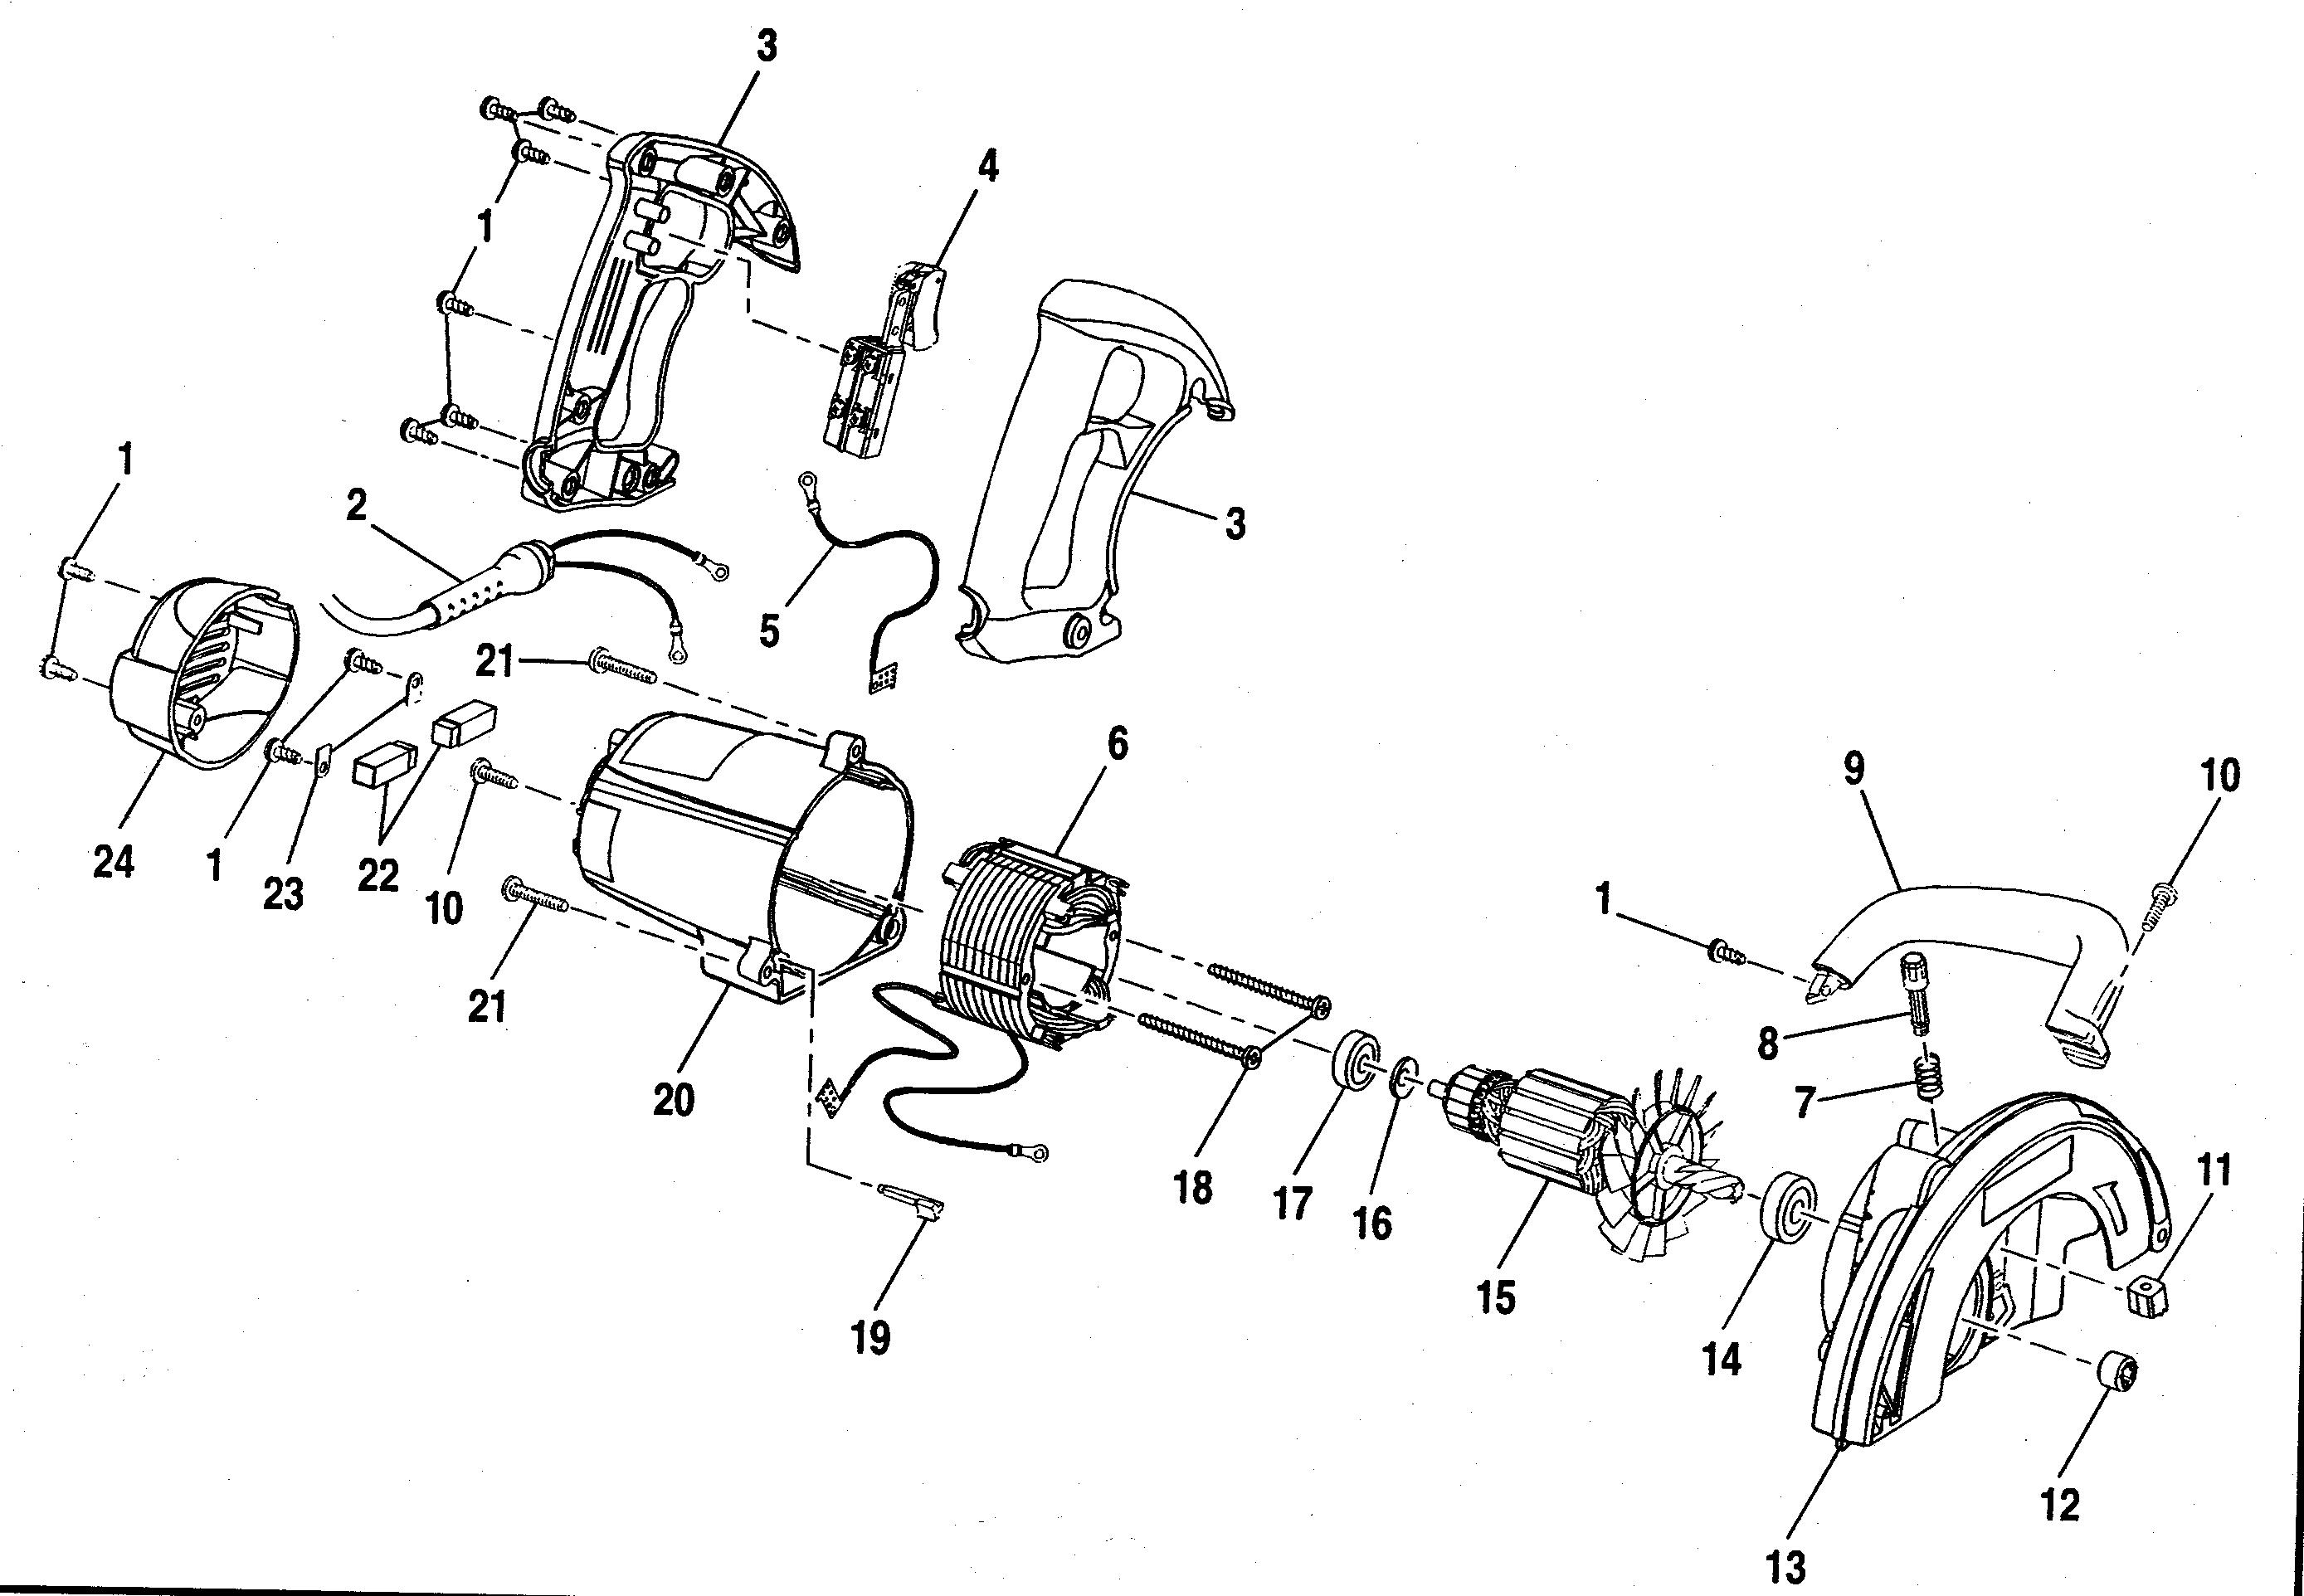 craftsman circular saw model 315271080